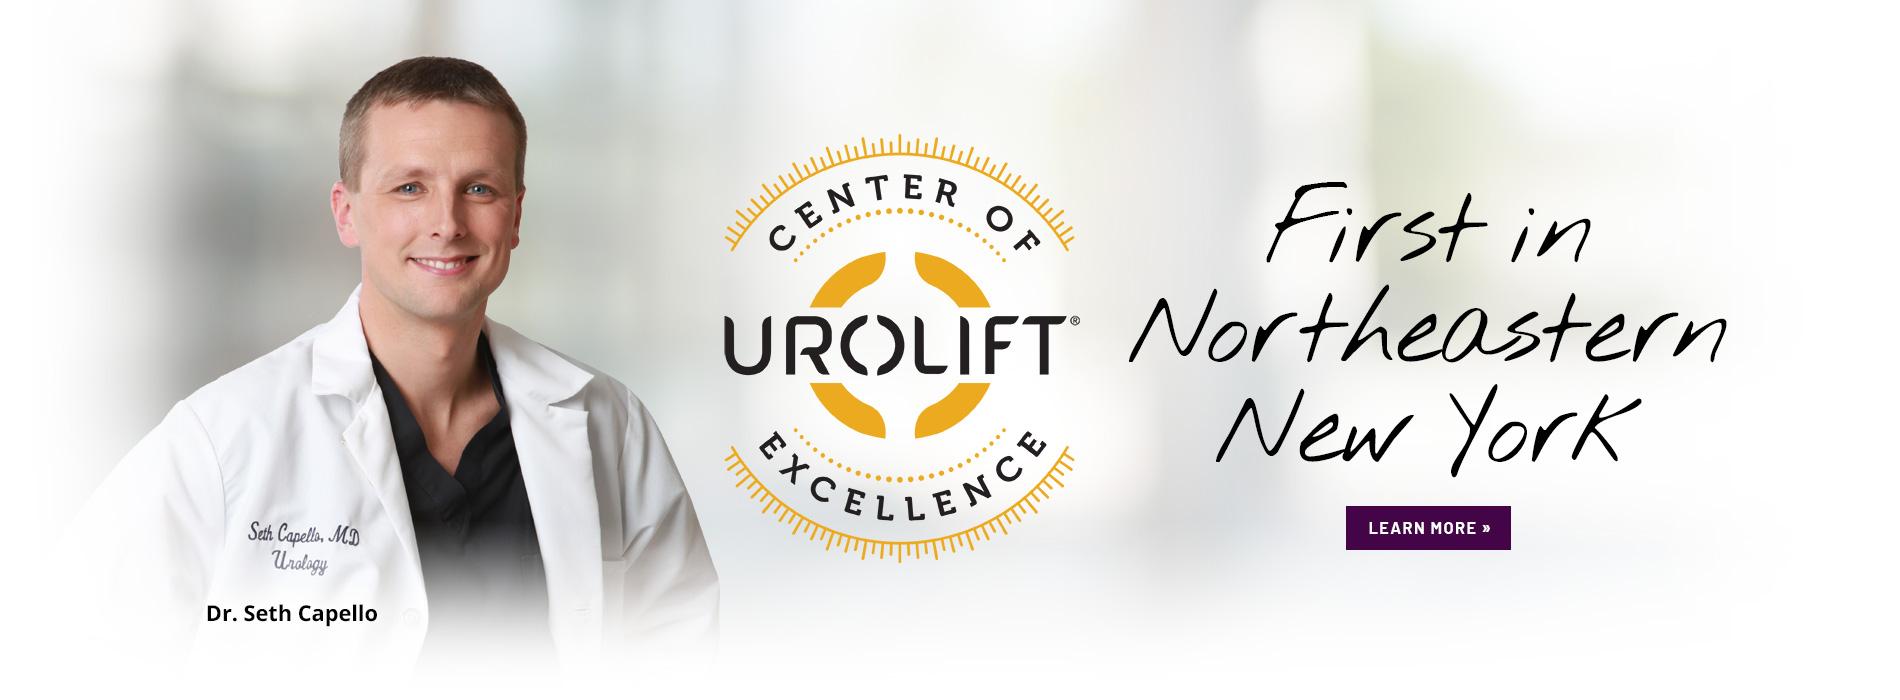 doctor next to urolift logo